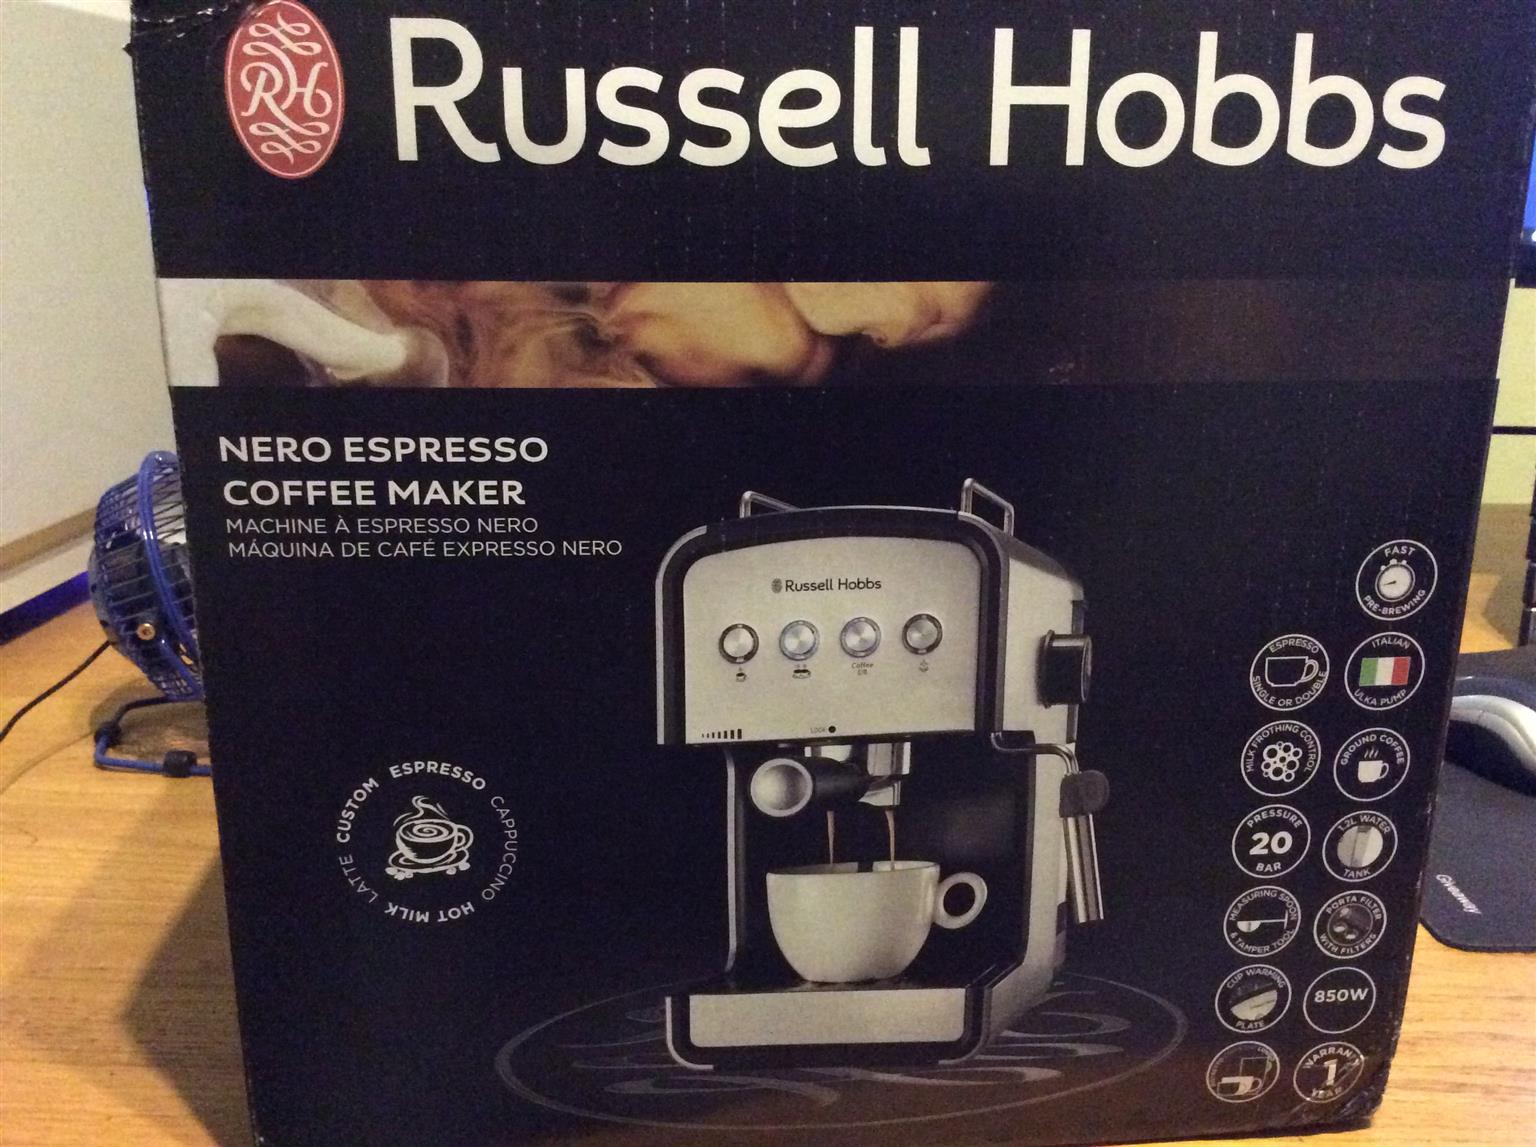 Russell Hobbs RH1916 Nero Espresso Coffee Maker for sale